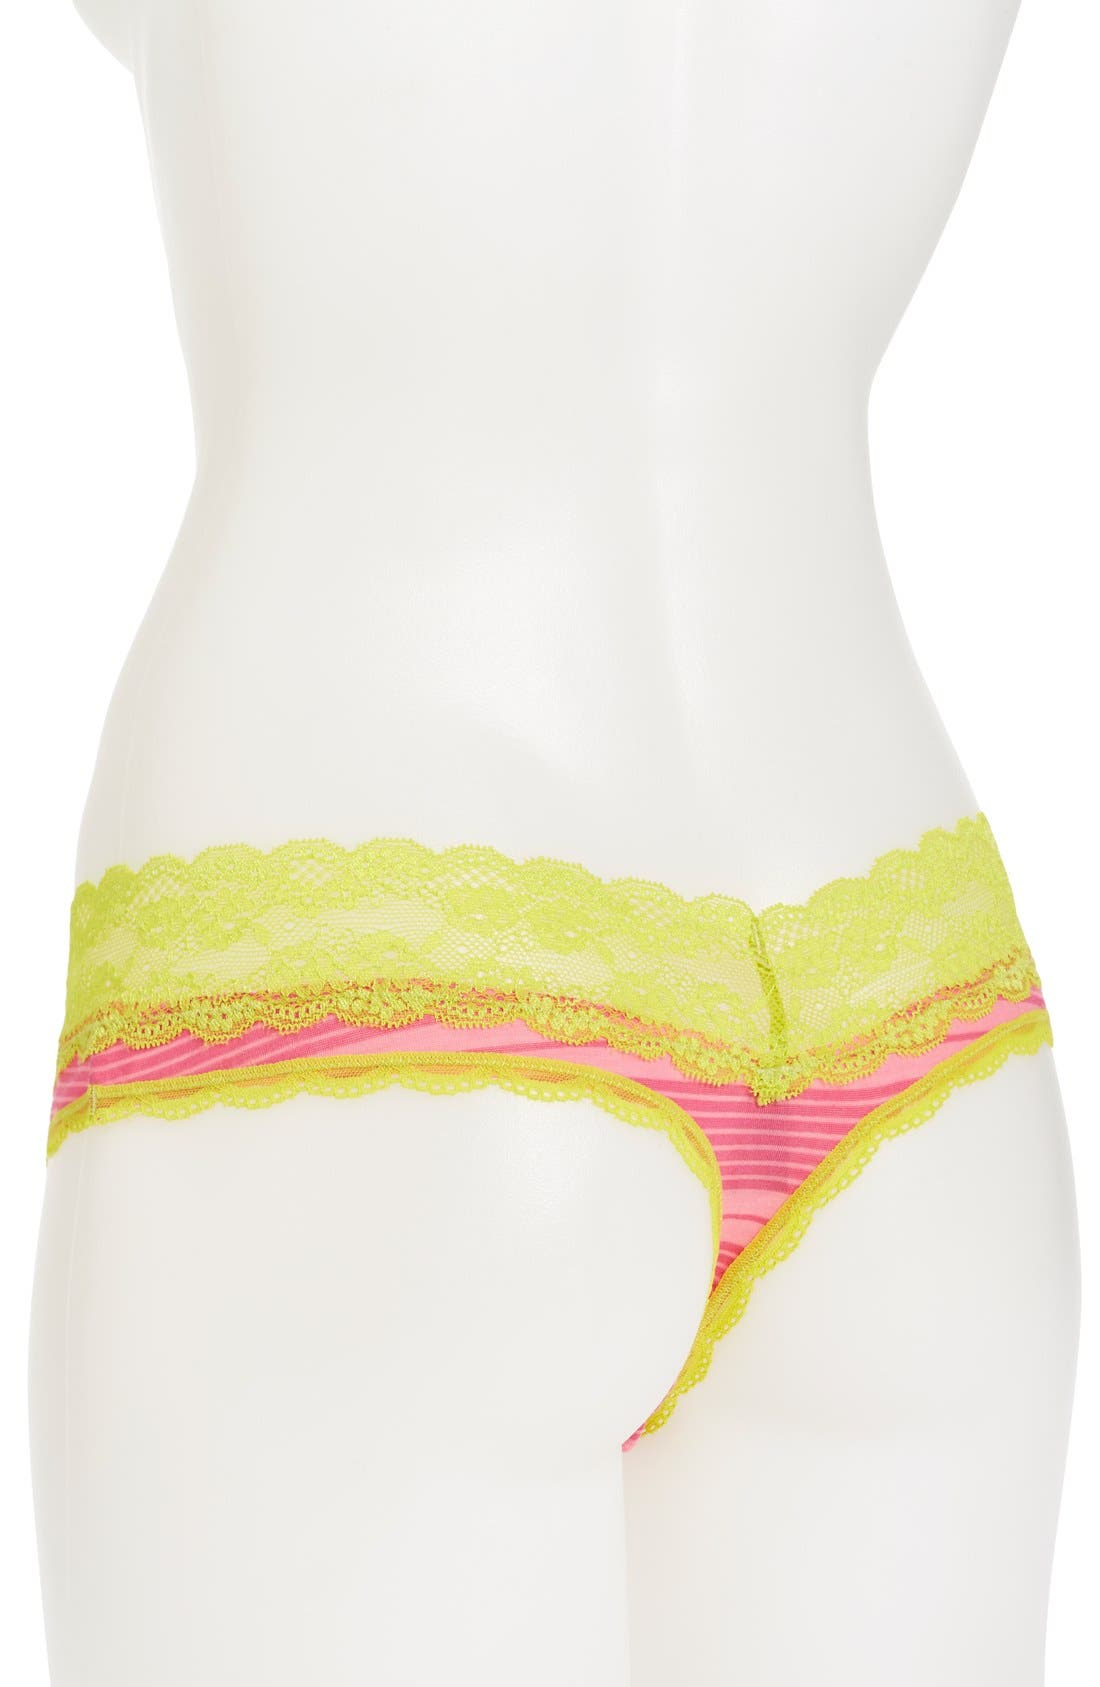 Alternate Image 2  - Honeydew Intimates 'Shadow Stripe' Lace Trim Thong